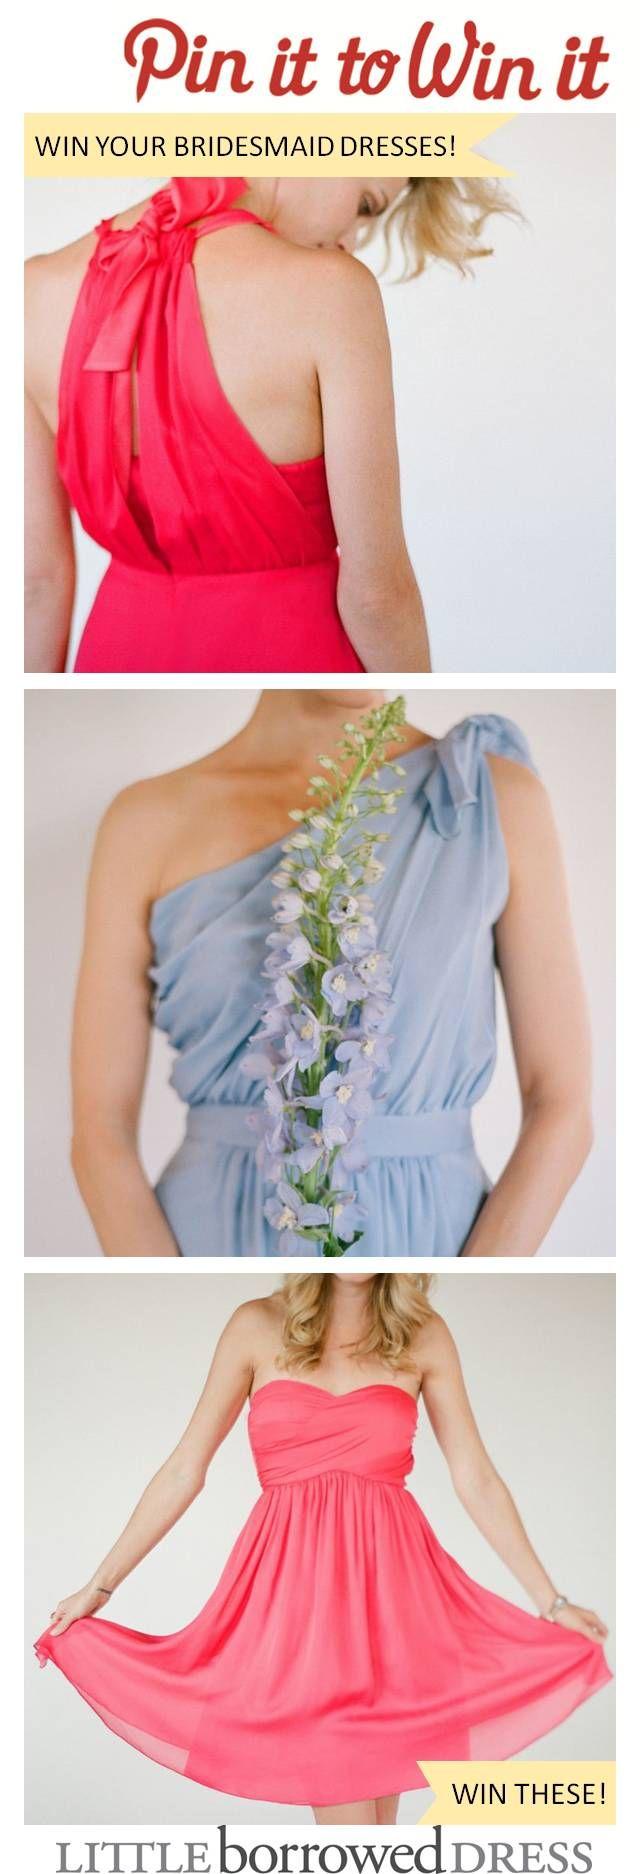 Watch Little Borrowed Dress Giveaway Rules video